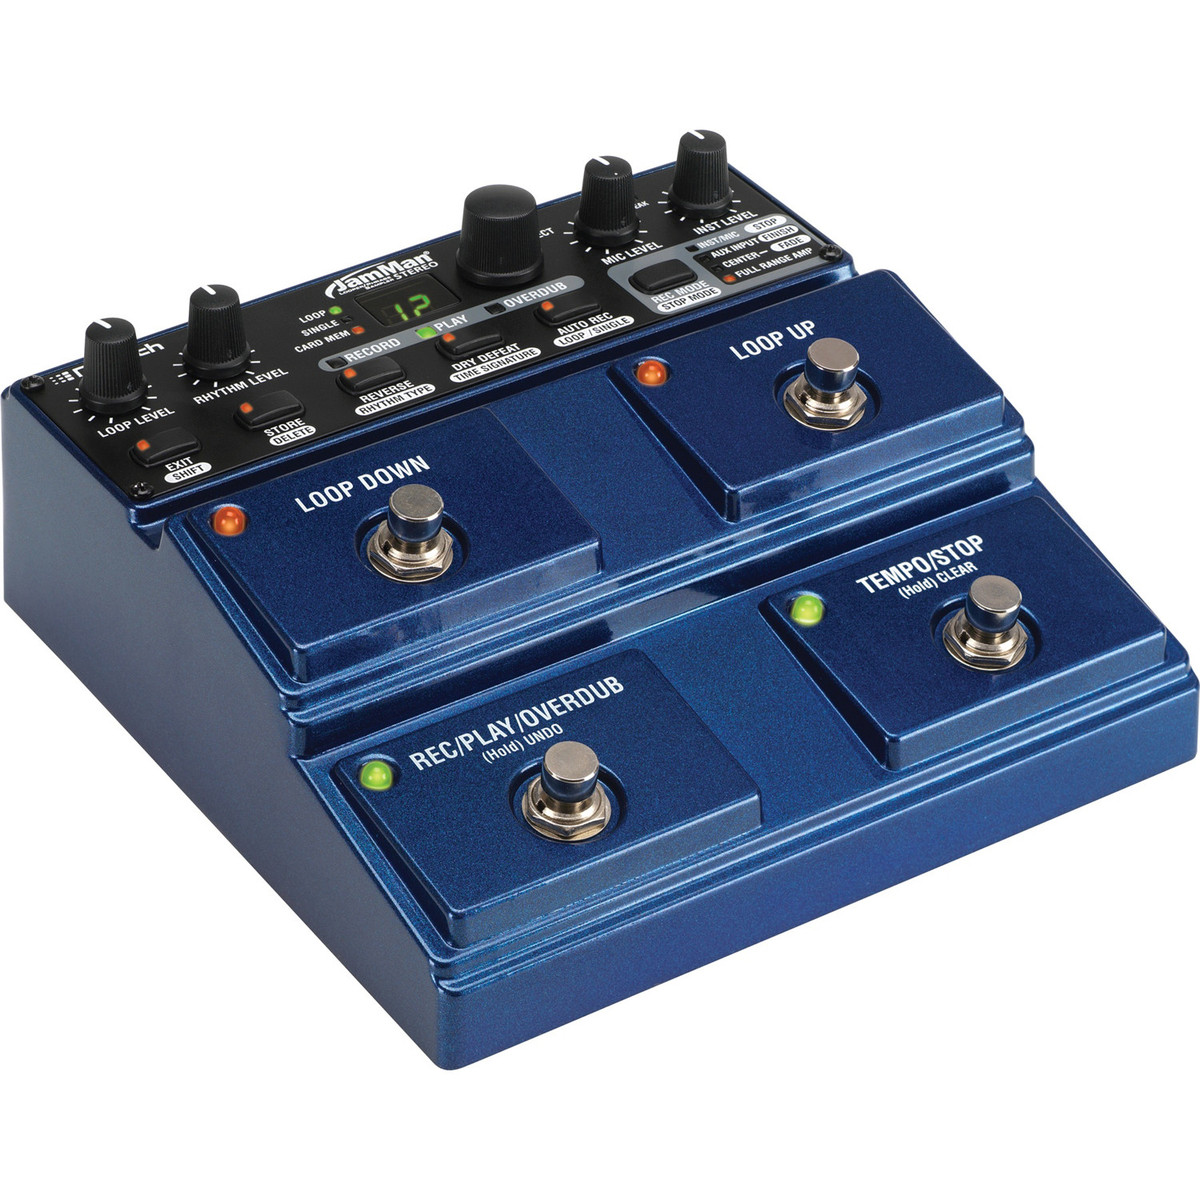 digitech jamman stereo looper phrase pedal at gear4music. Black Bedroom Furniture Sets. Home Design Ideas